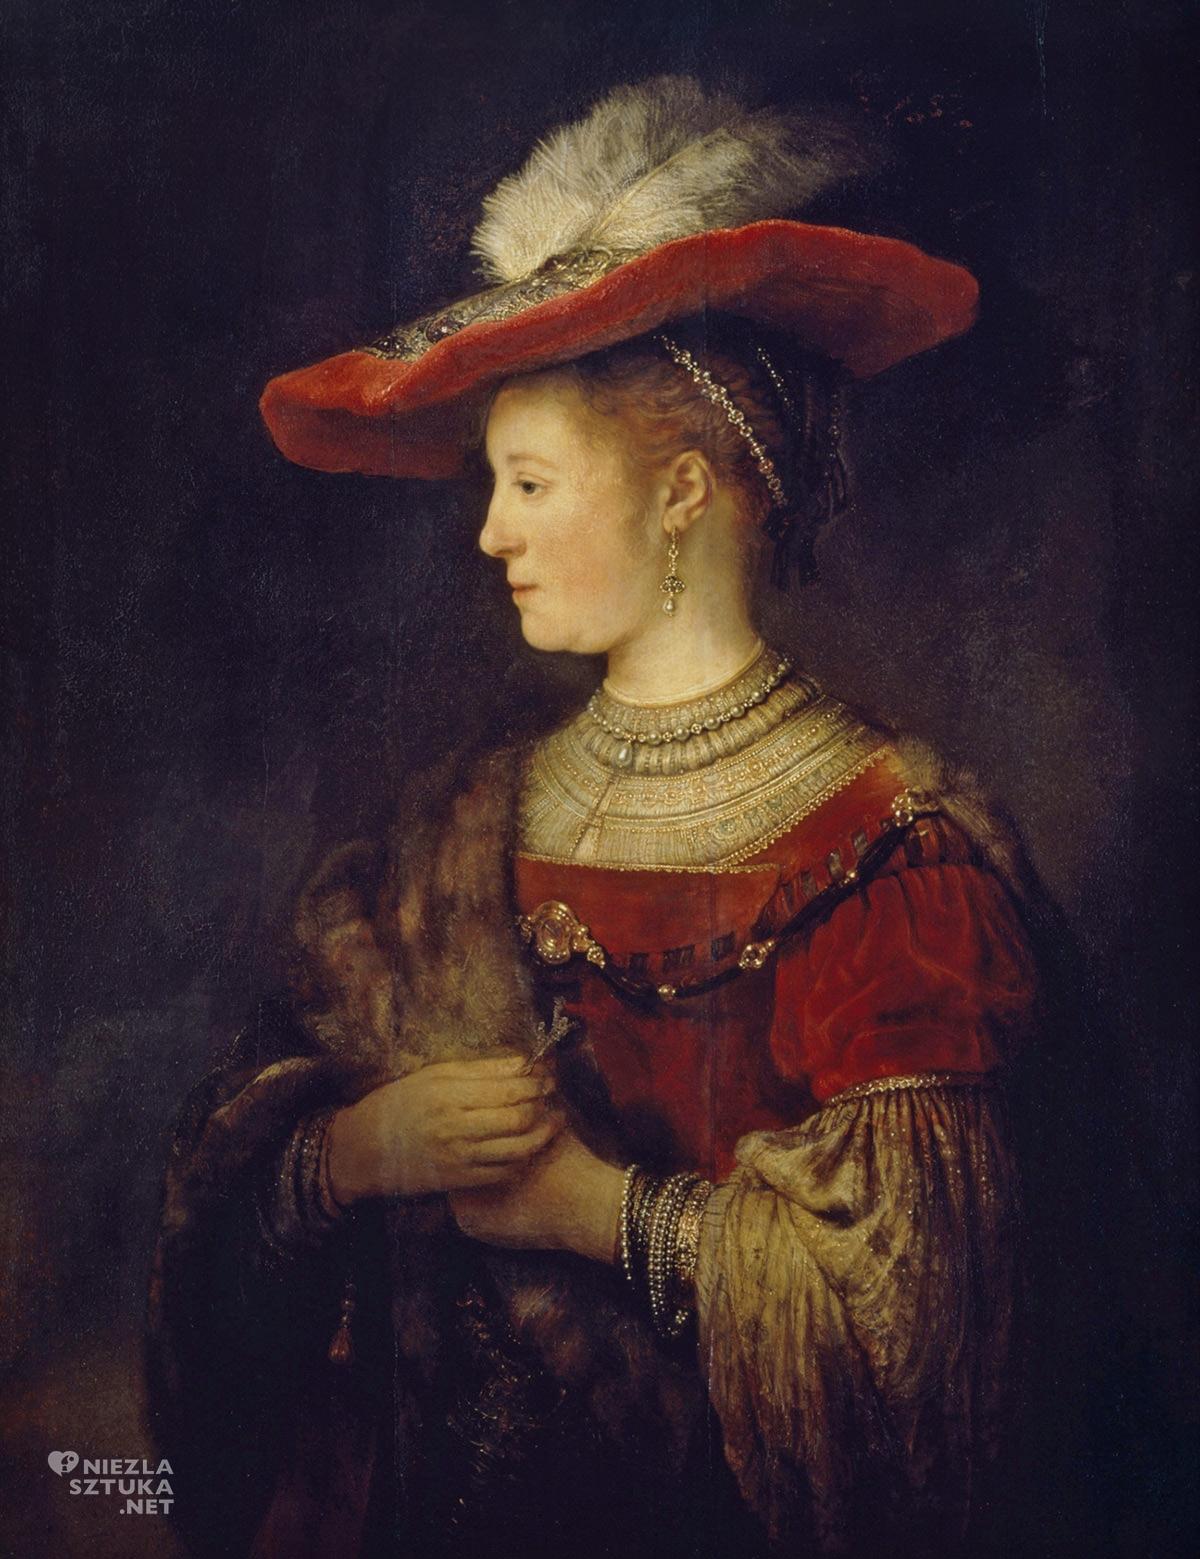 Rembrandt, Saskia w czerwonym kapeluszu, sztuka niderlandzka, żona artysty, Niezła Sztuka